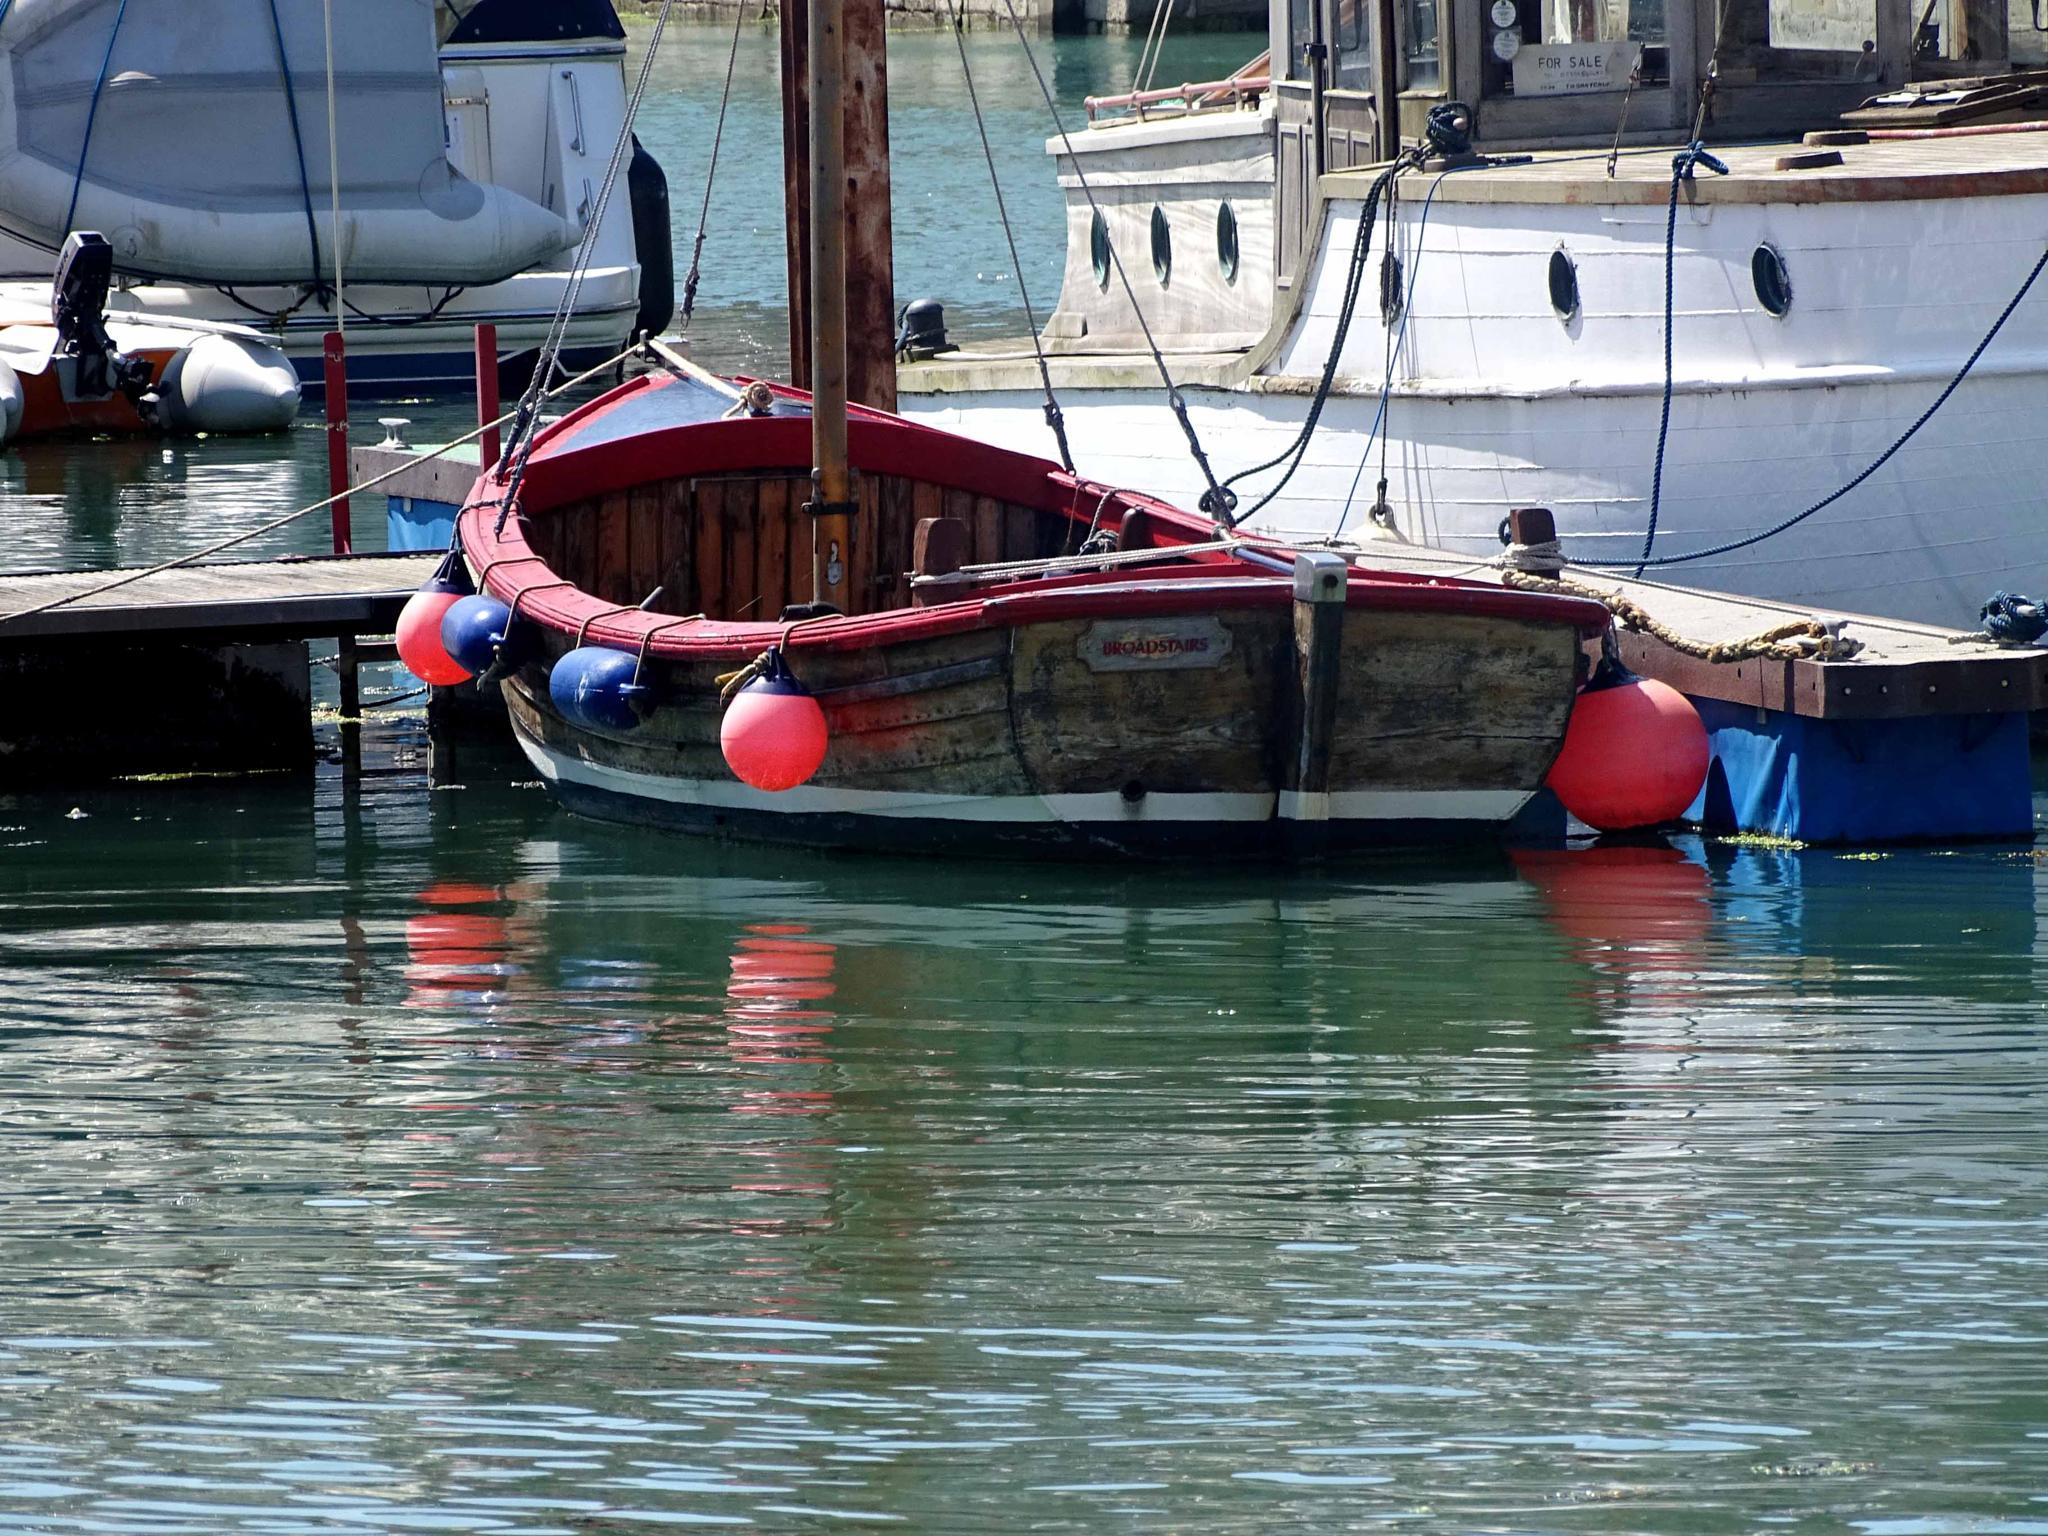 Ramsgate harbour Kent by JATTATIRVA